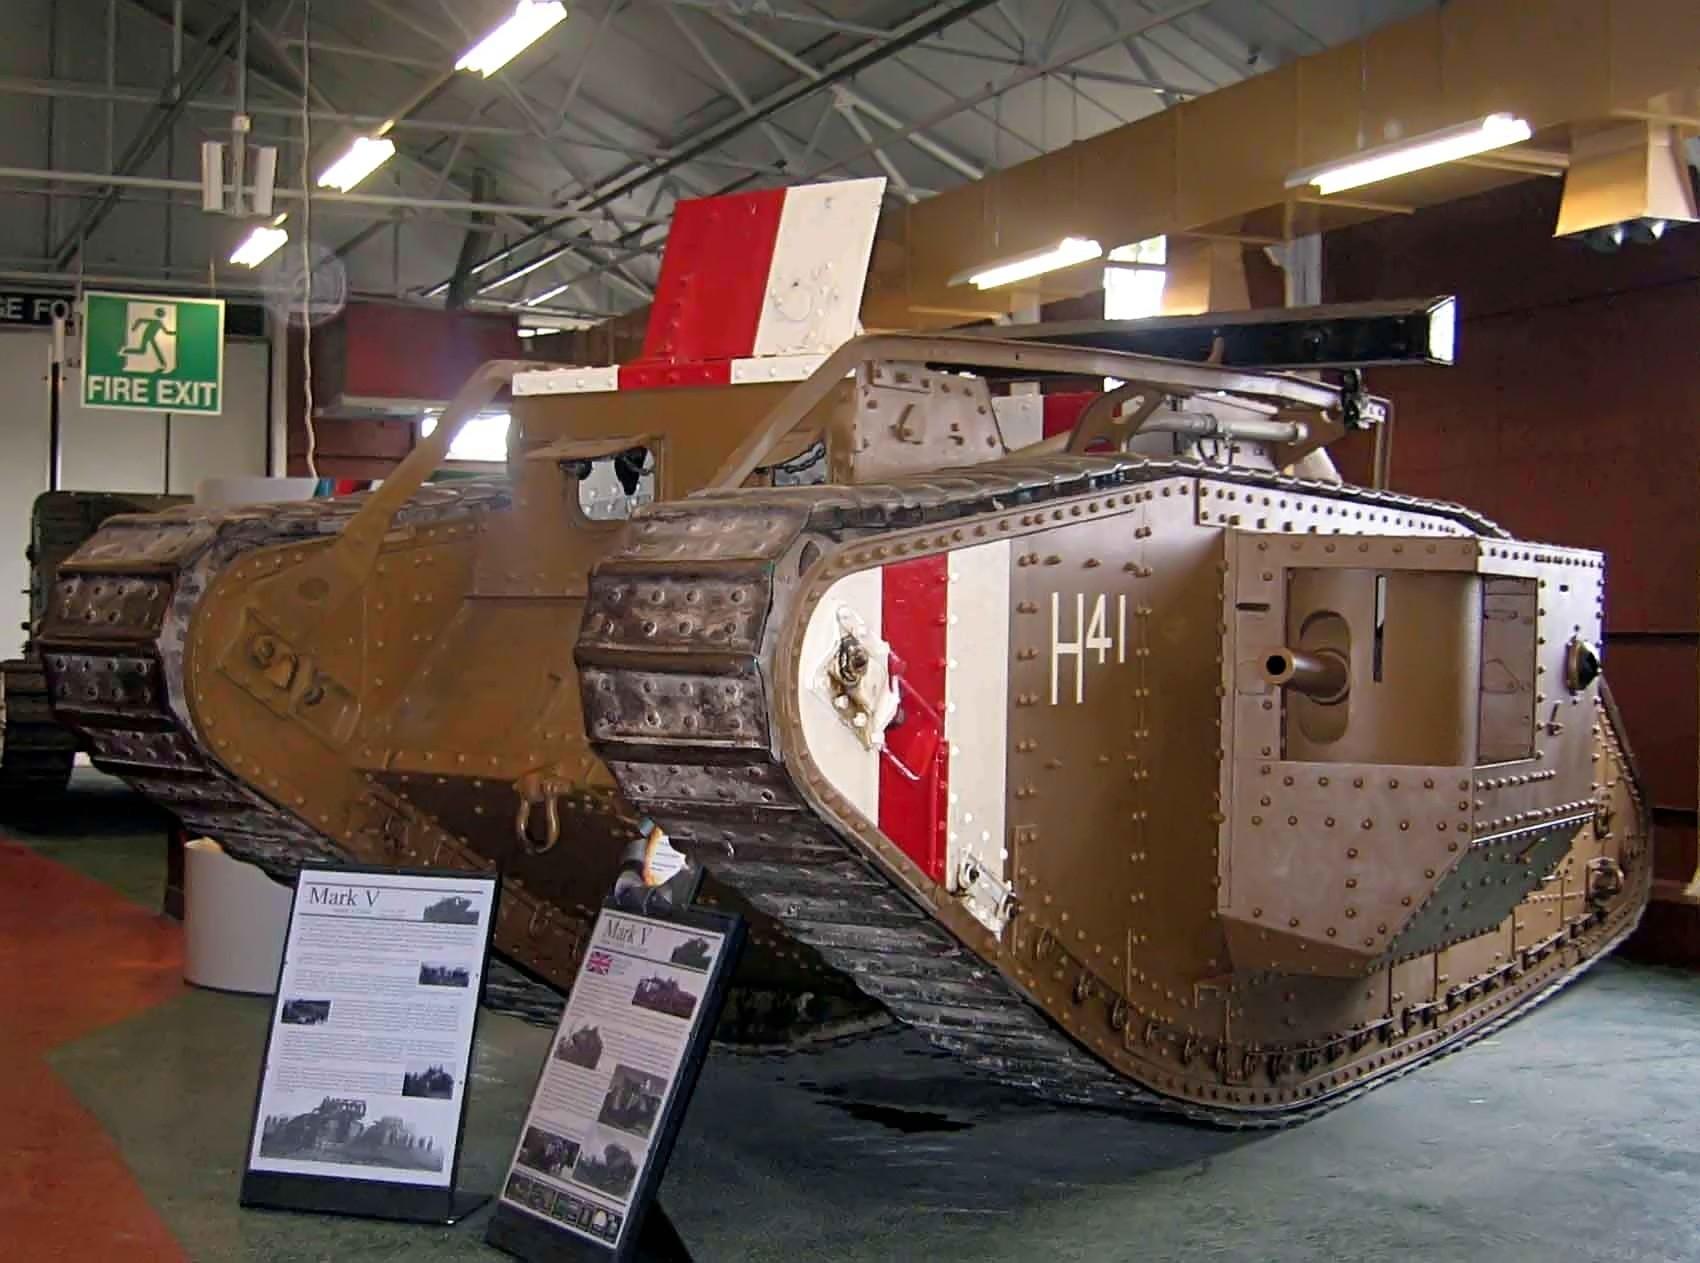 http://upload.wikimedia.org/wikipedia/commons/5/5f/WW1_Tank_Mark_V%2C_Bovington.jpg